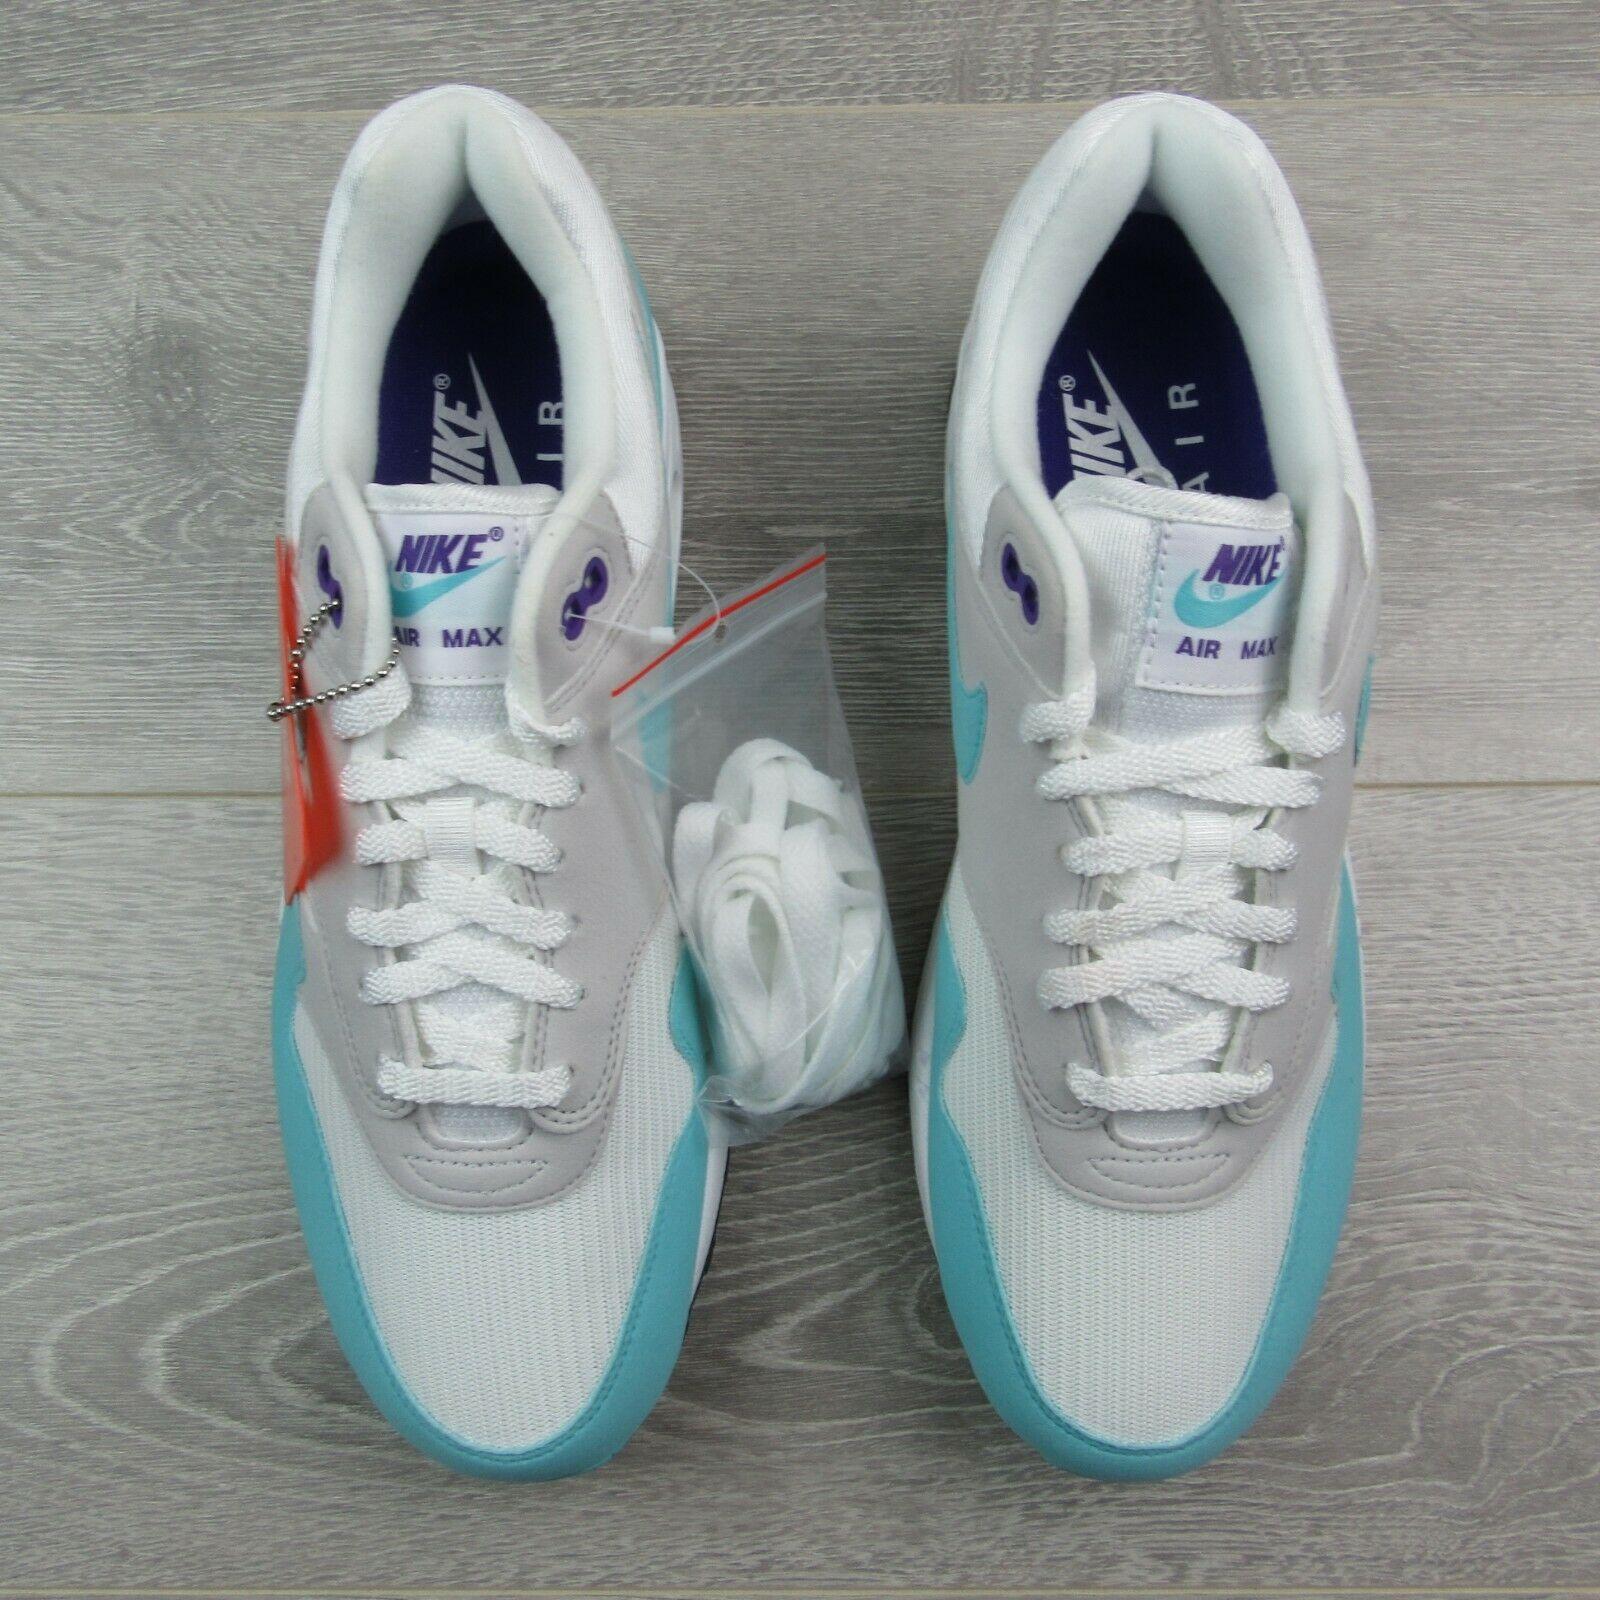 Nike Air Max 1 Anniversary White Aqua Grey Black Green Blue Sz 10.5 908375 105